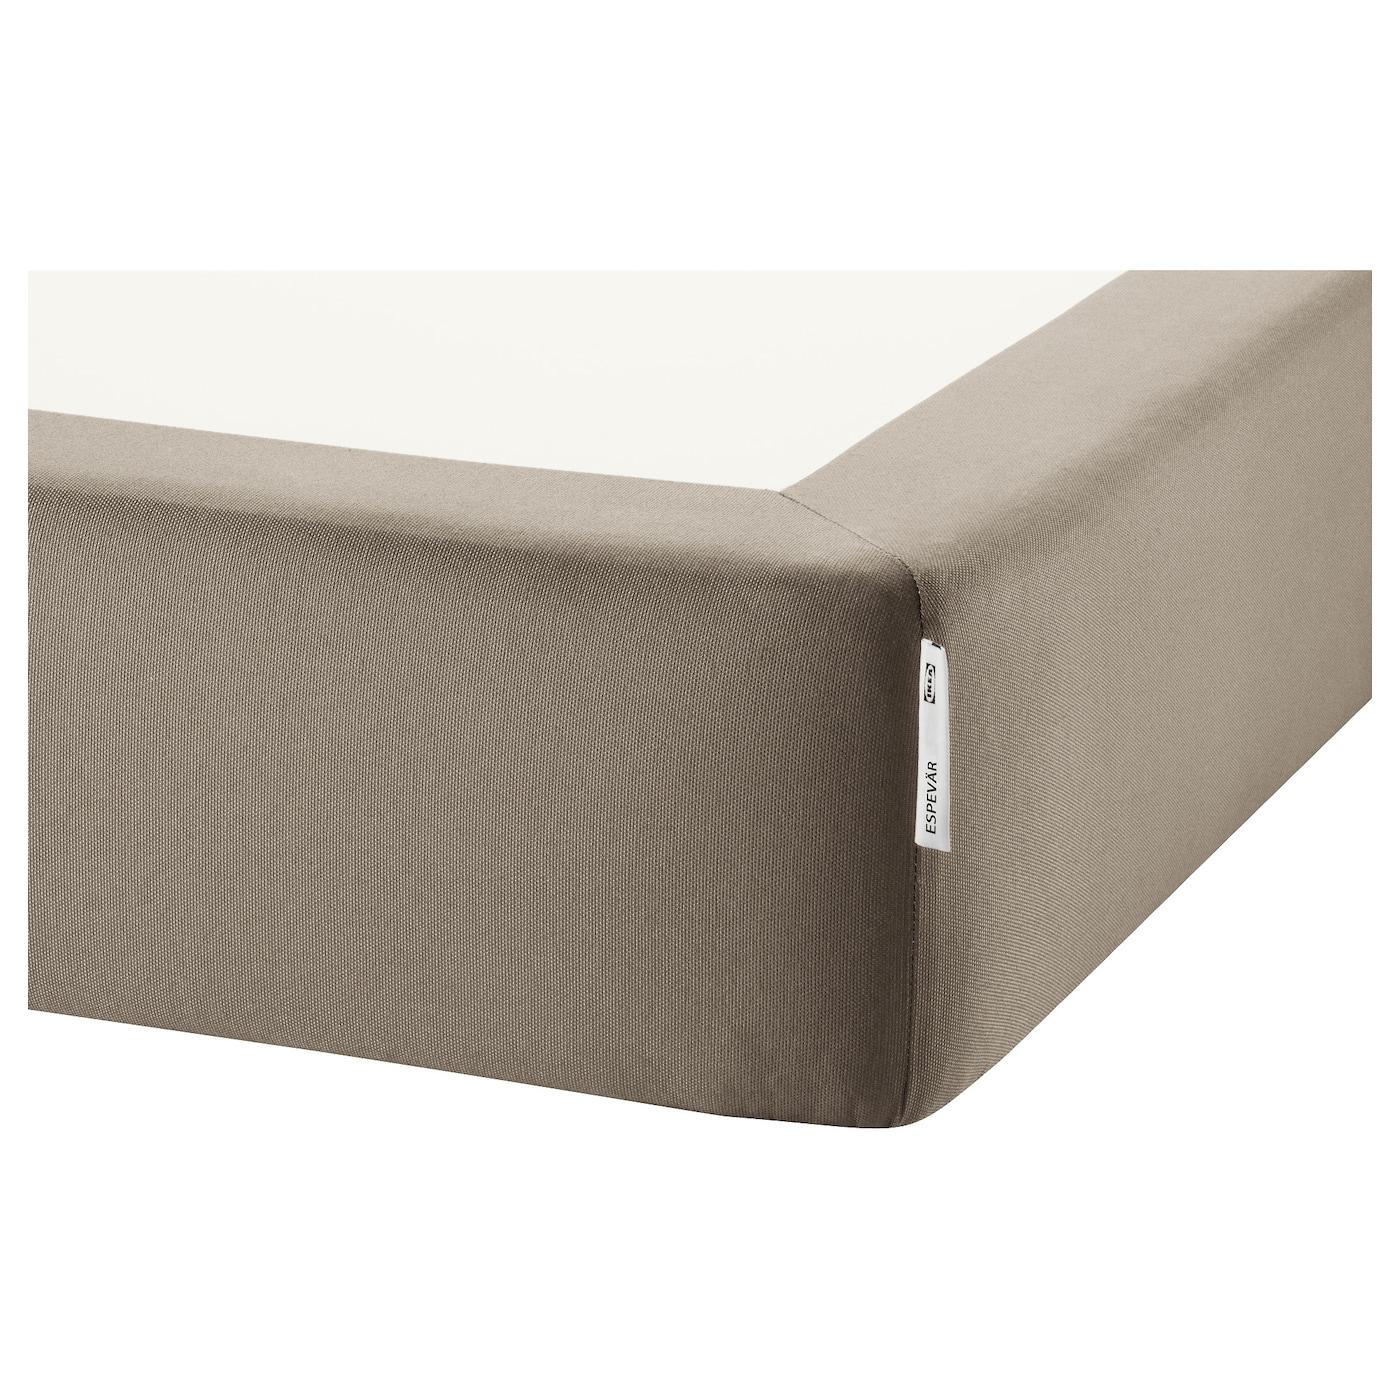 espev r sommier lattes beige fonc 160x200 cm ikea. Black Bedroom Furniture Sets. Home Design Ideas